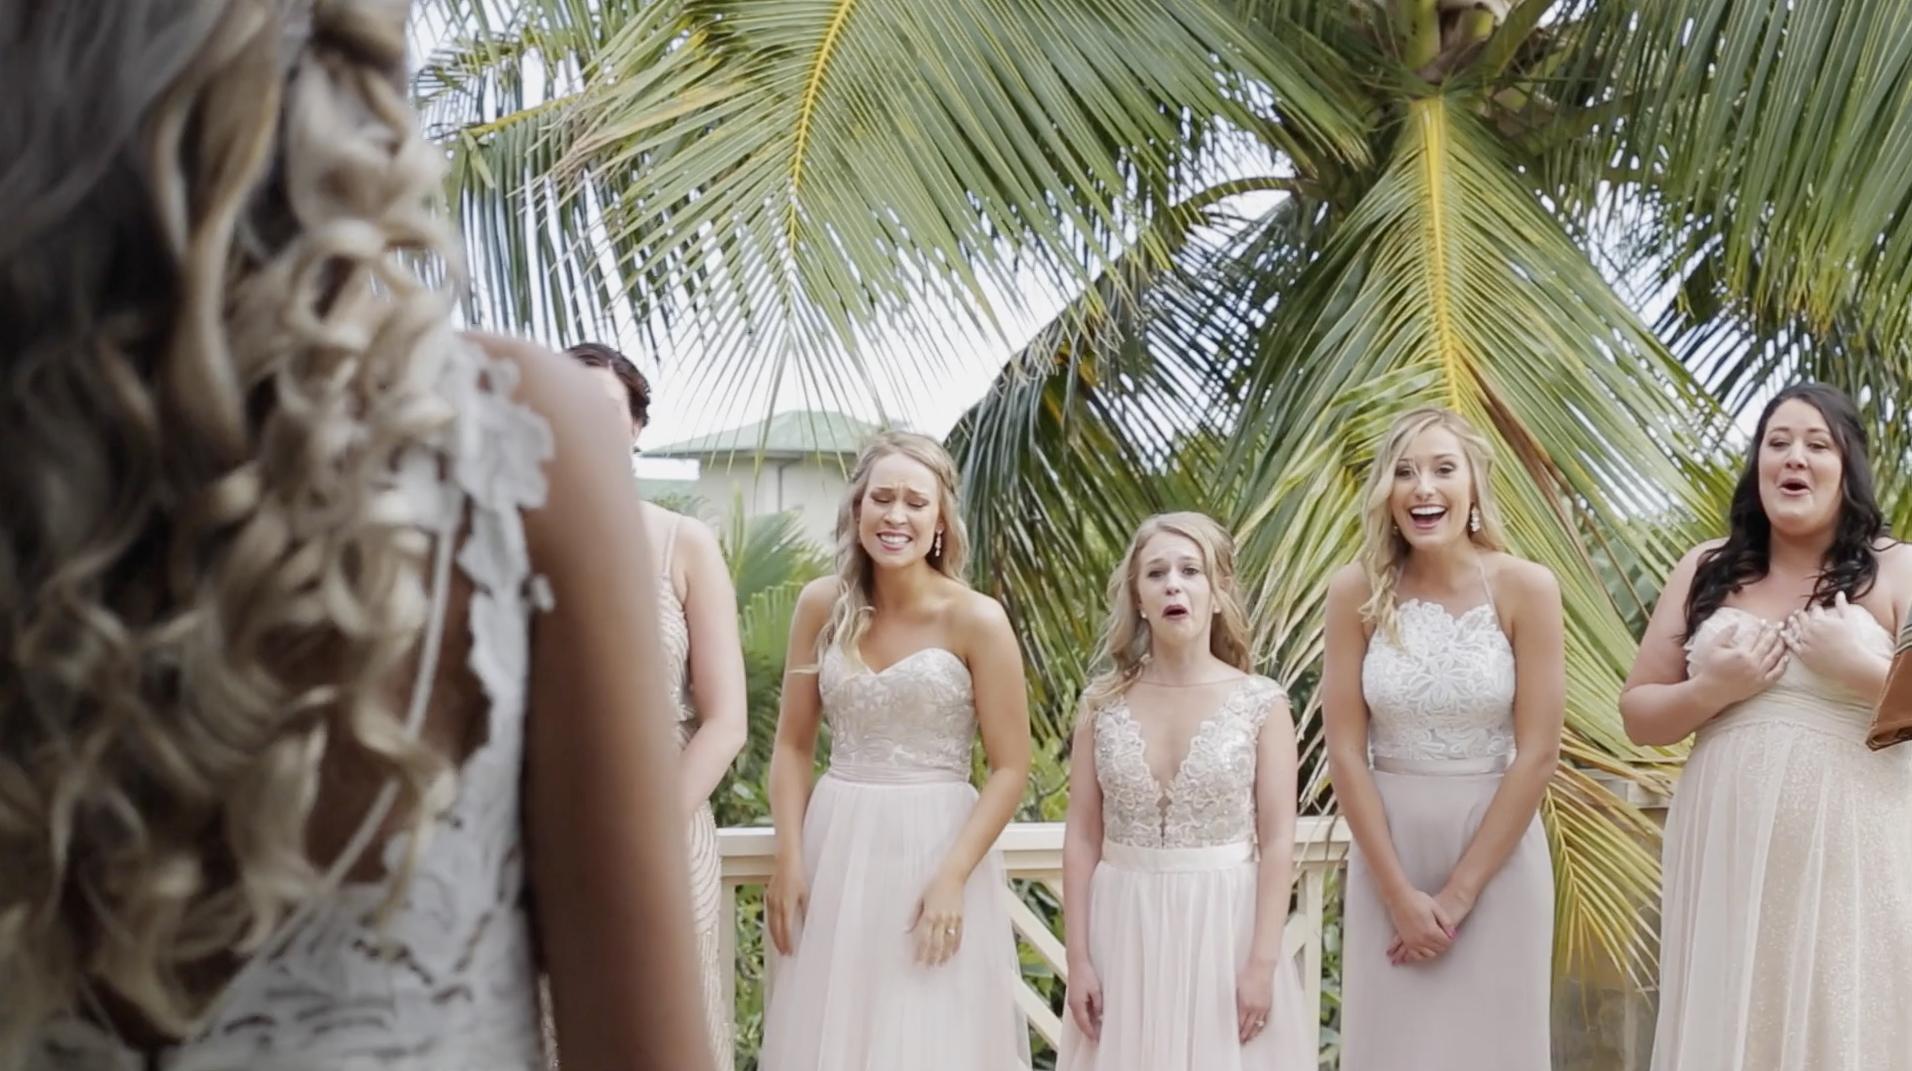 Bridesmaids First Look of Wedding Dress